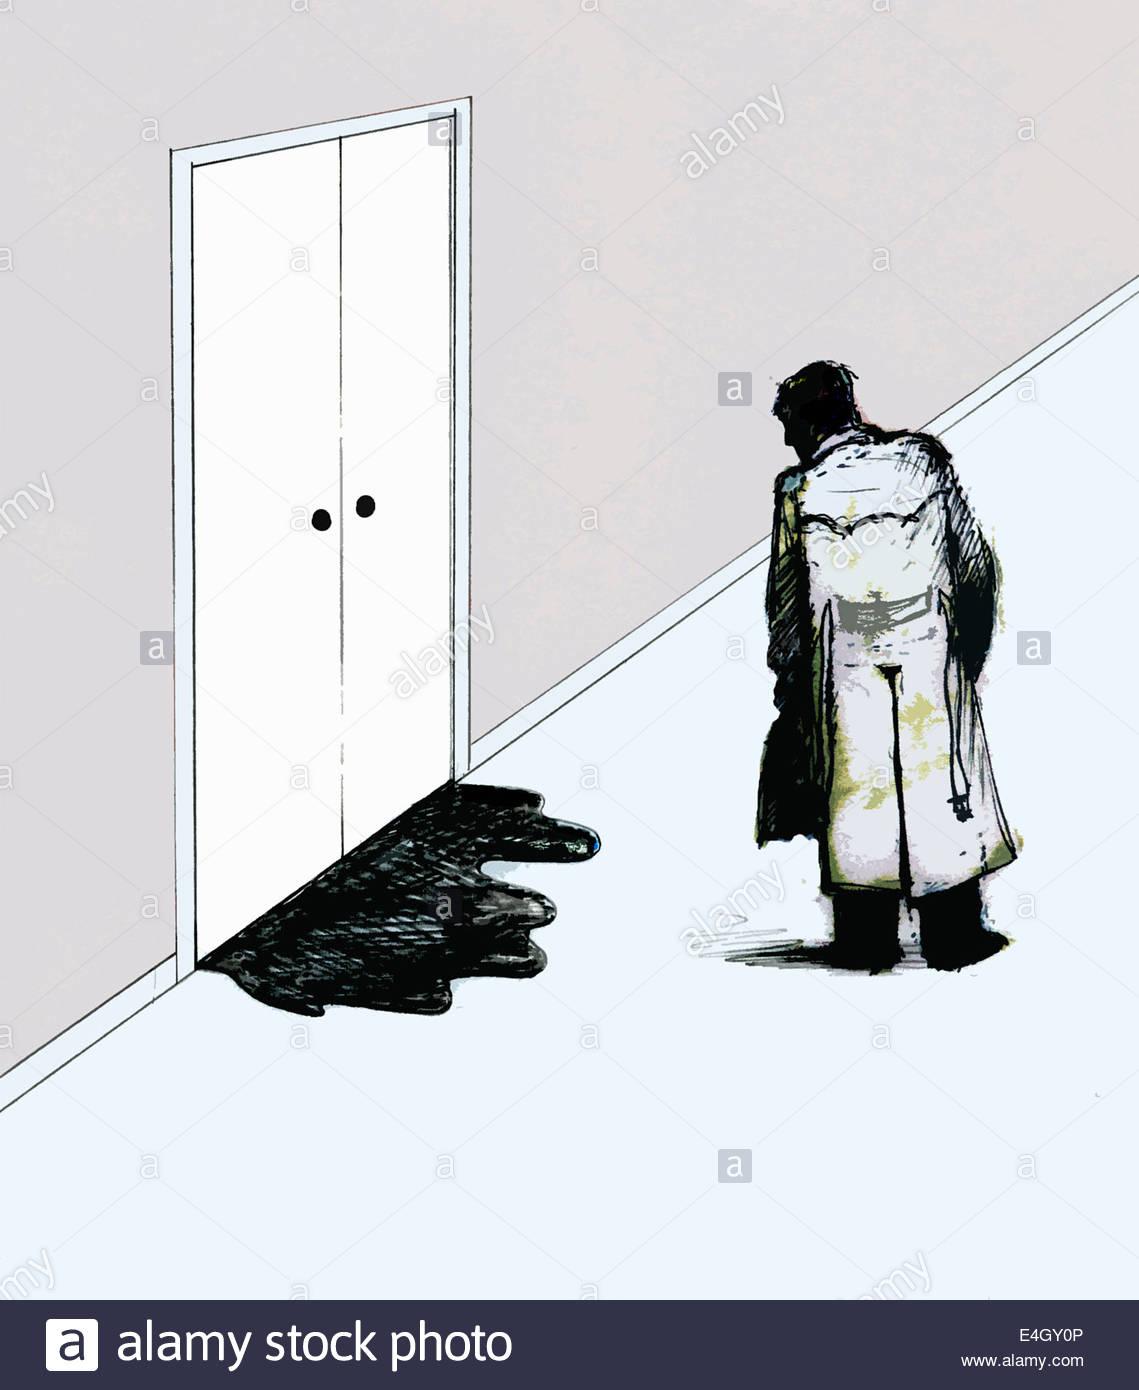 Businessman looking at liquid leaking below closed door - Stock Image